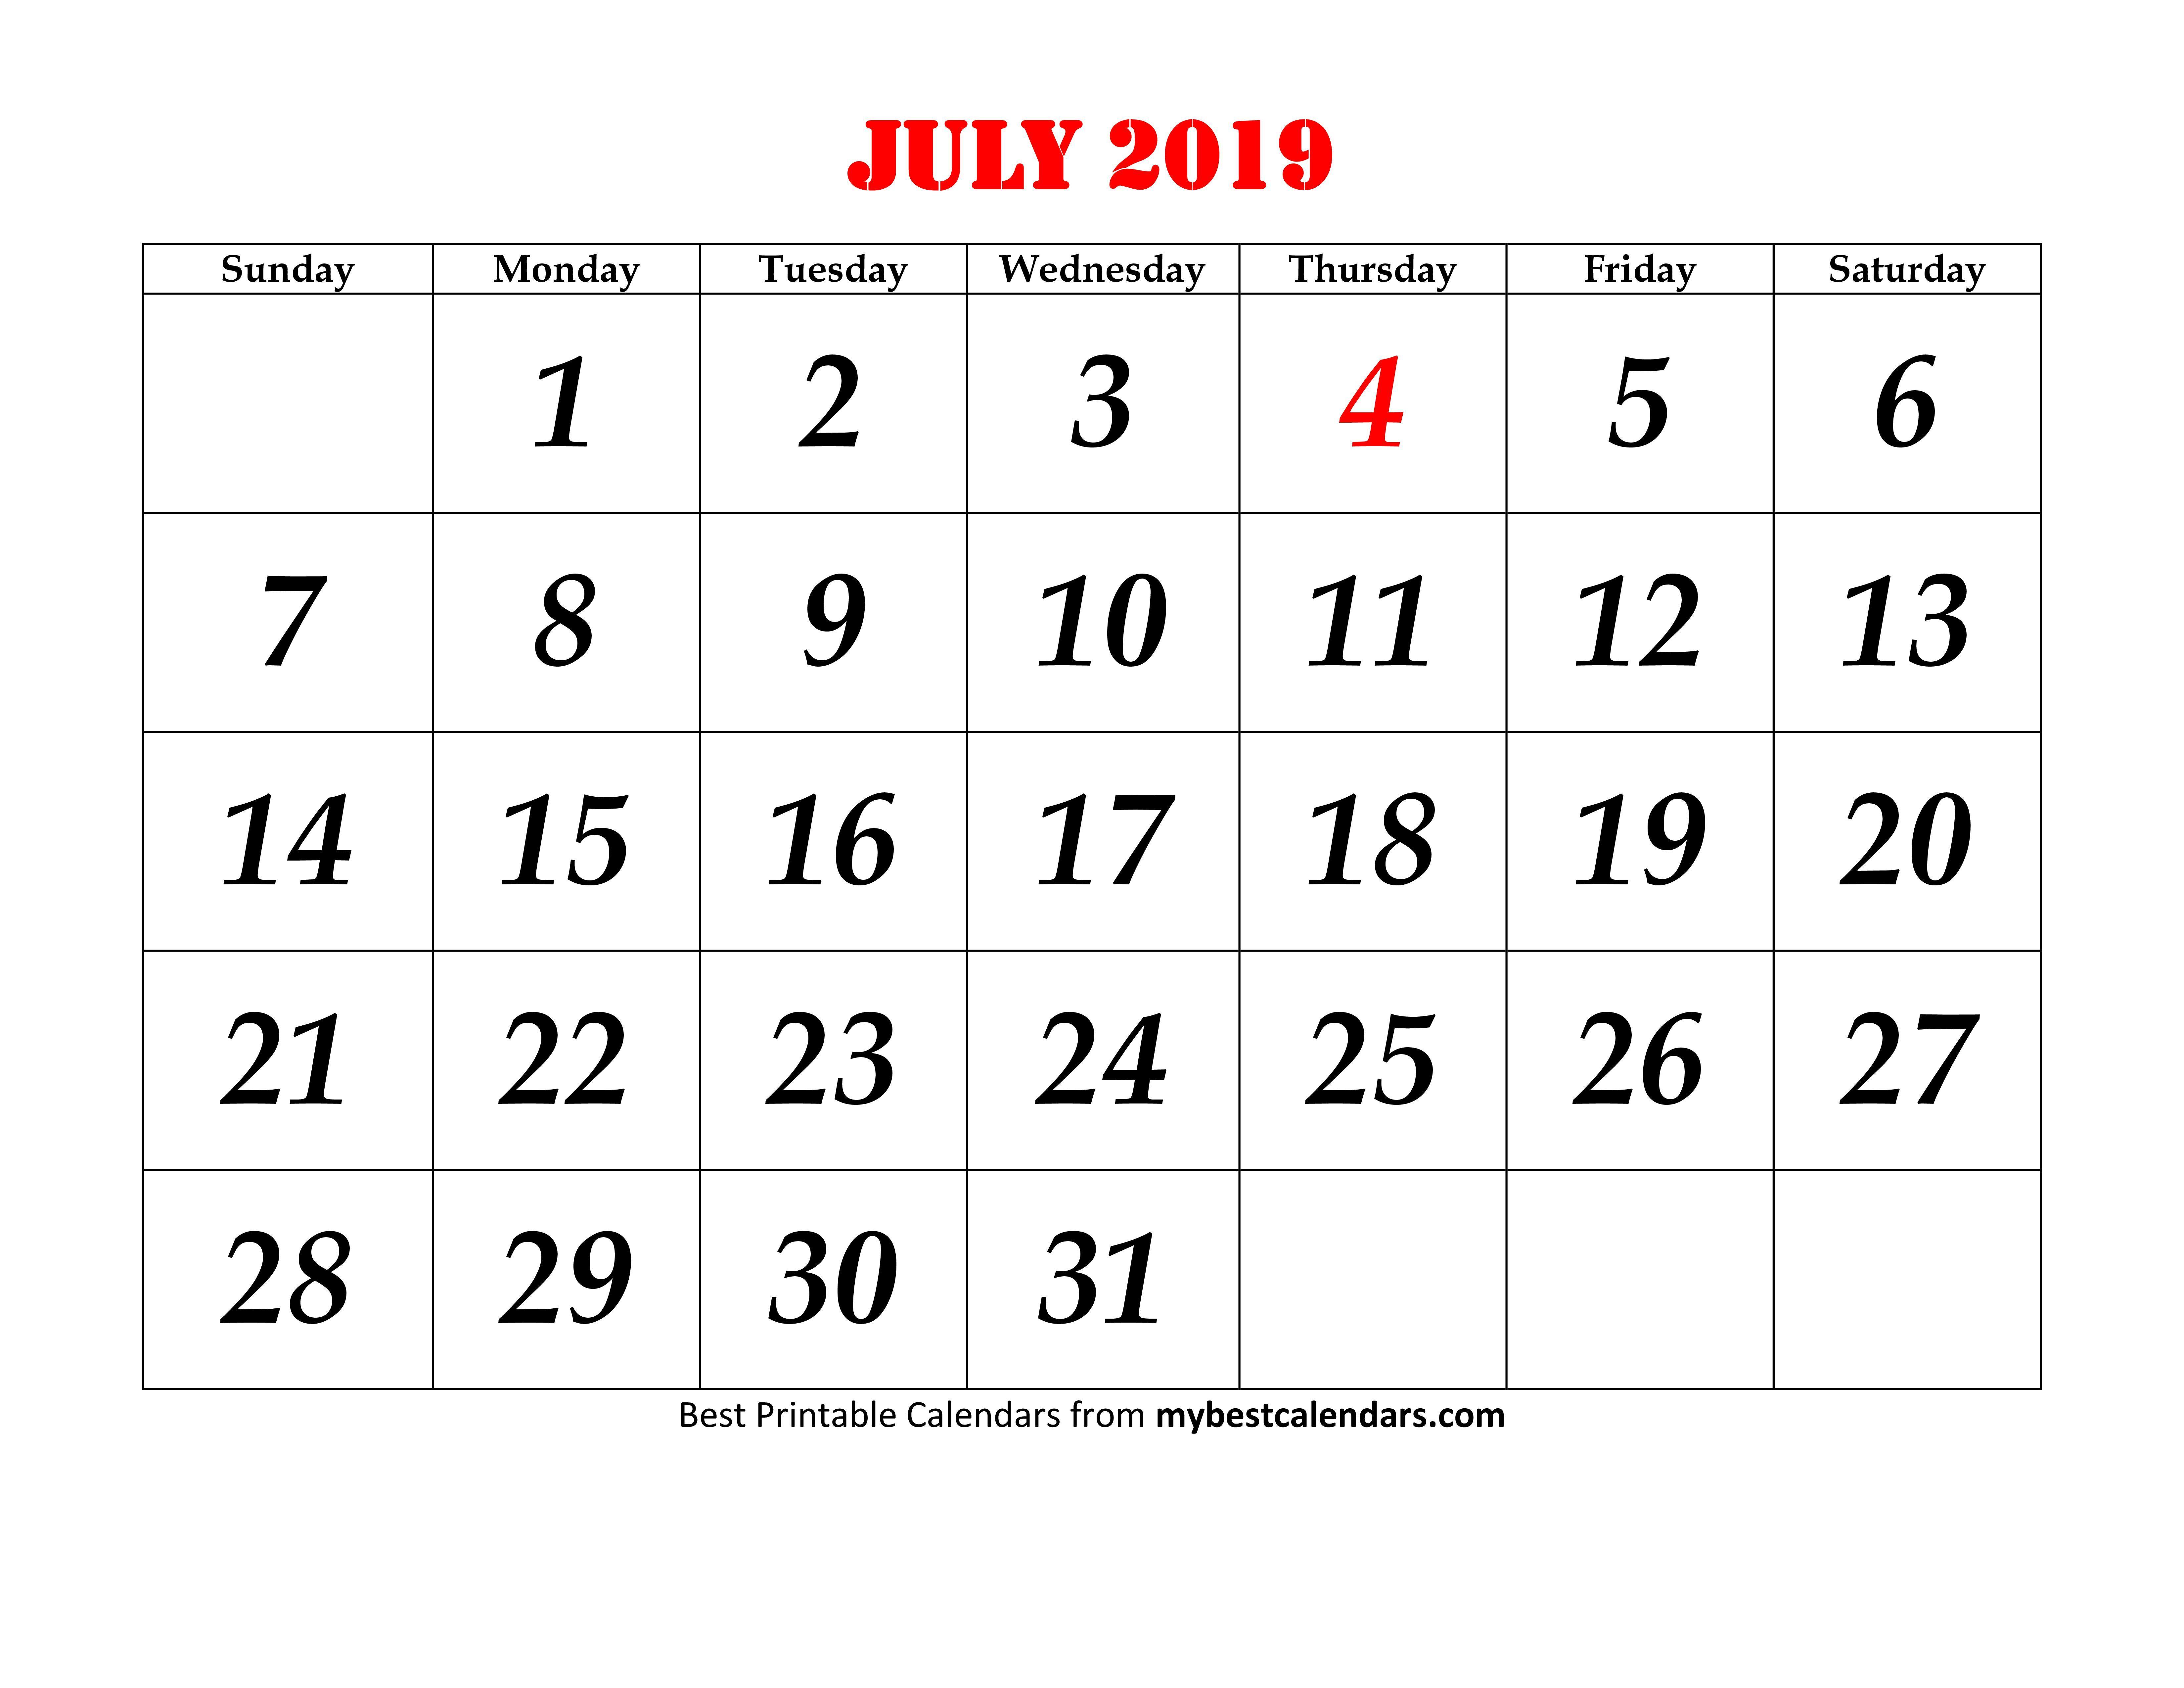 July 2019 Printable Calendar Blank Templates - Calendar Hour - 2019 in July Calendar Printable Template